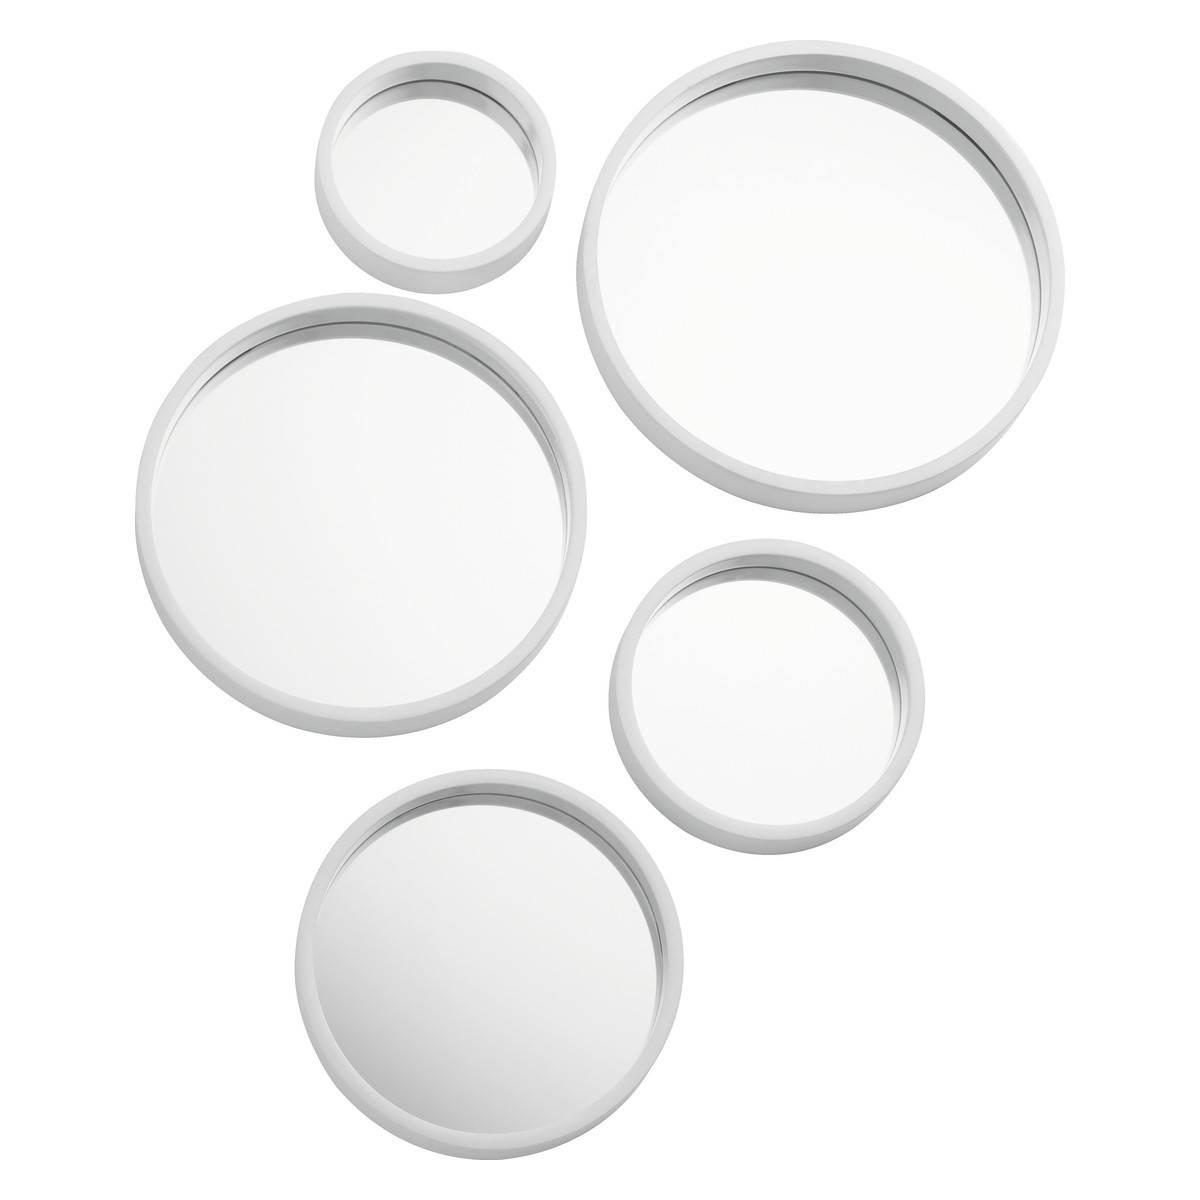 Mirror Mirror Set Of 5 White Round Mirrors | Buy Now At Habitat Uk with regard to White Round Mirrors (Image 9 of 15)